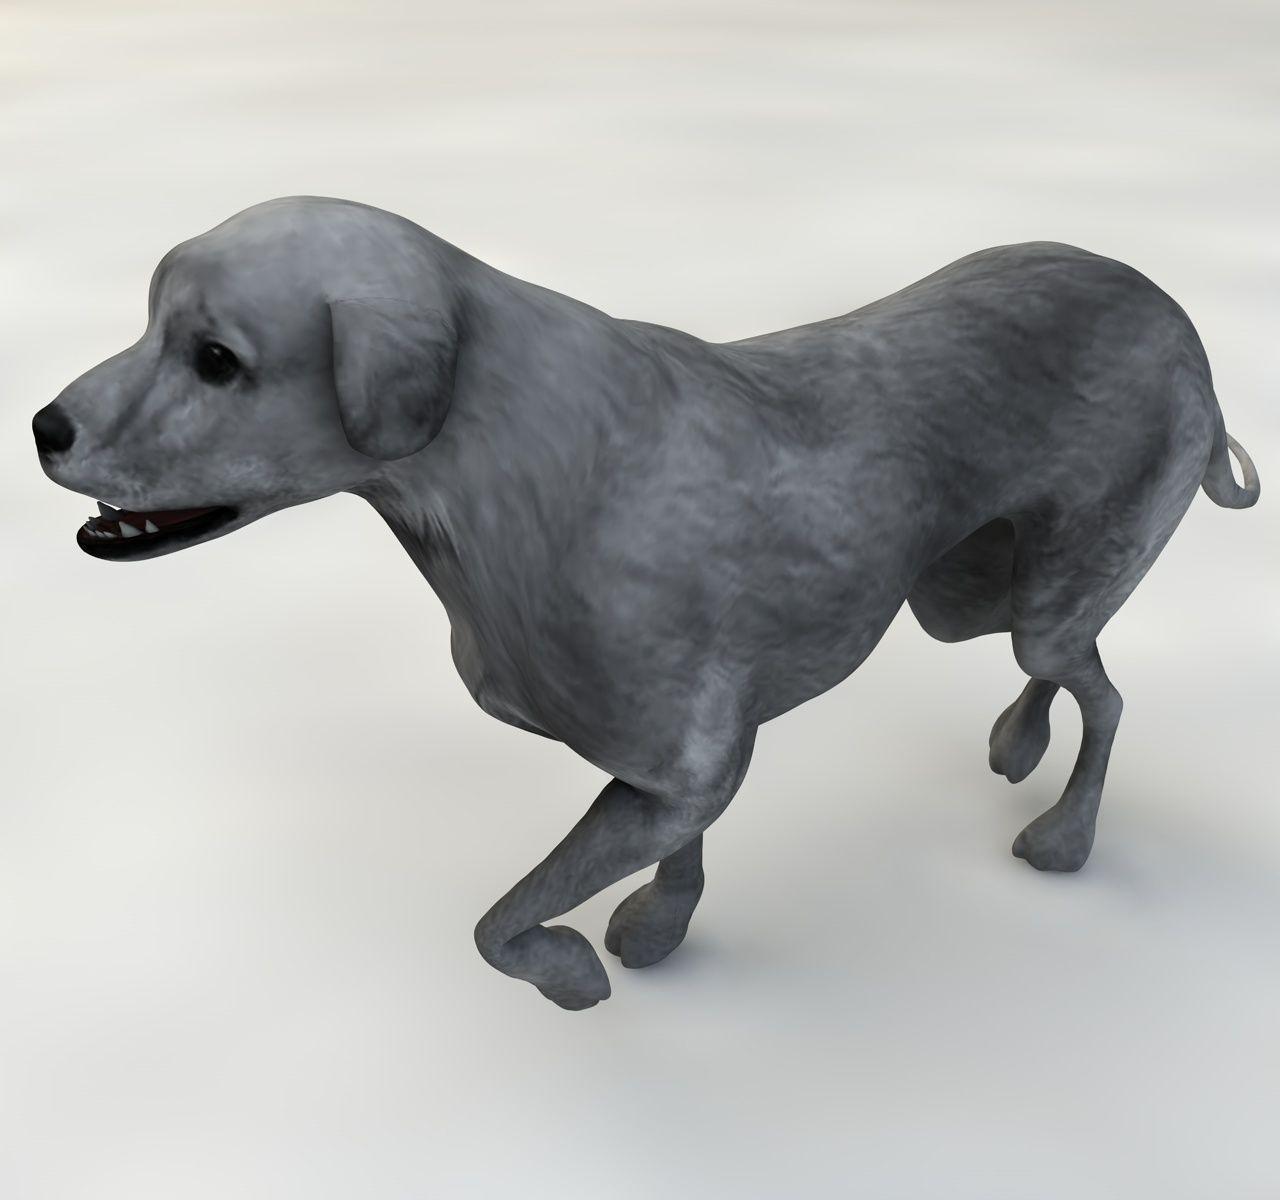 Dog half breed 3d model animated rigged max c4d cgtrader com